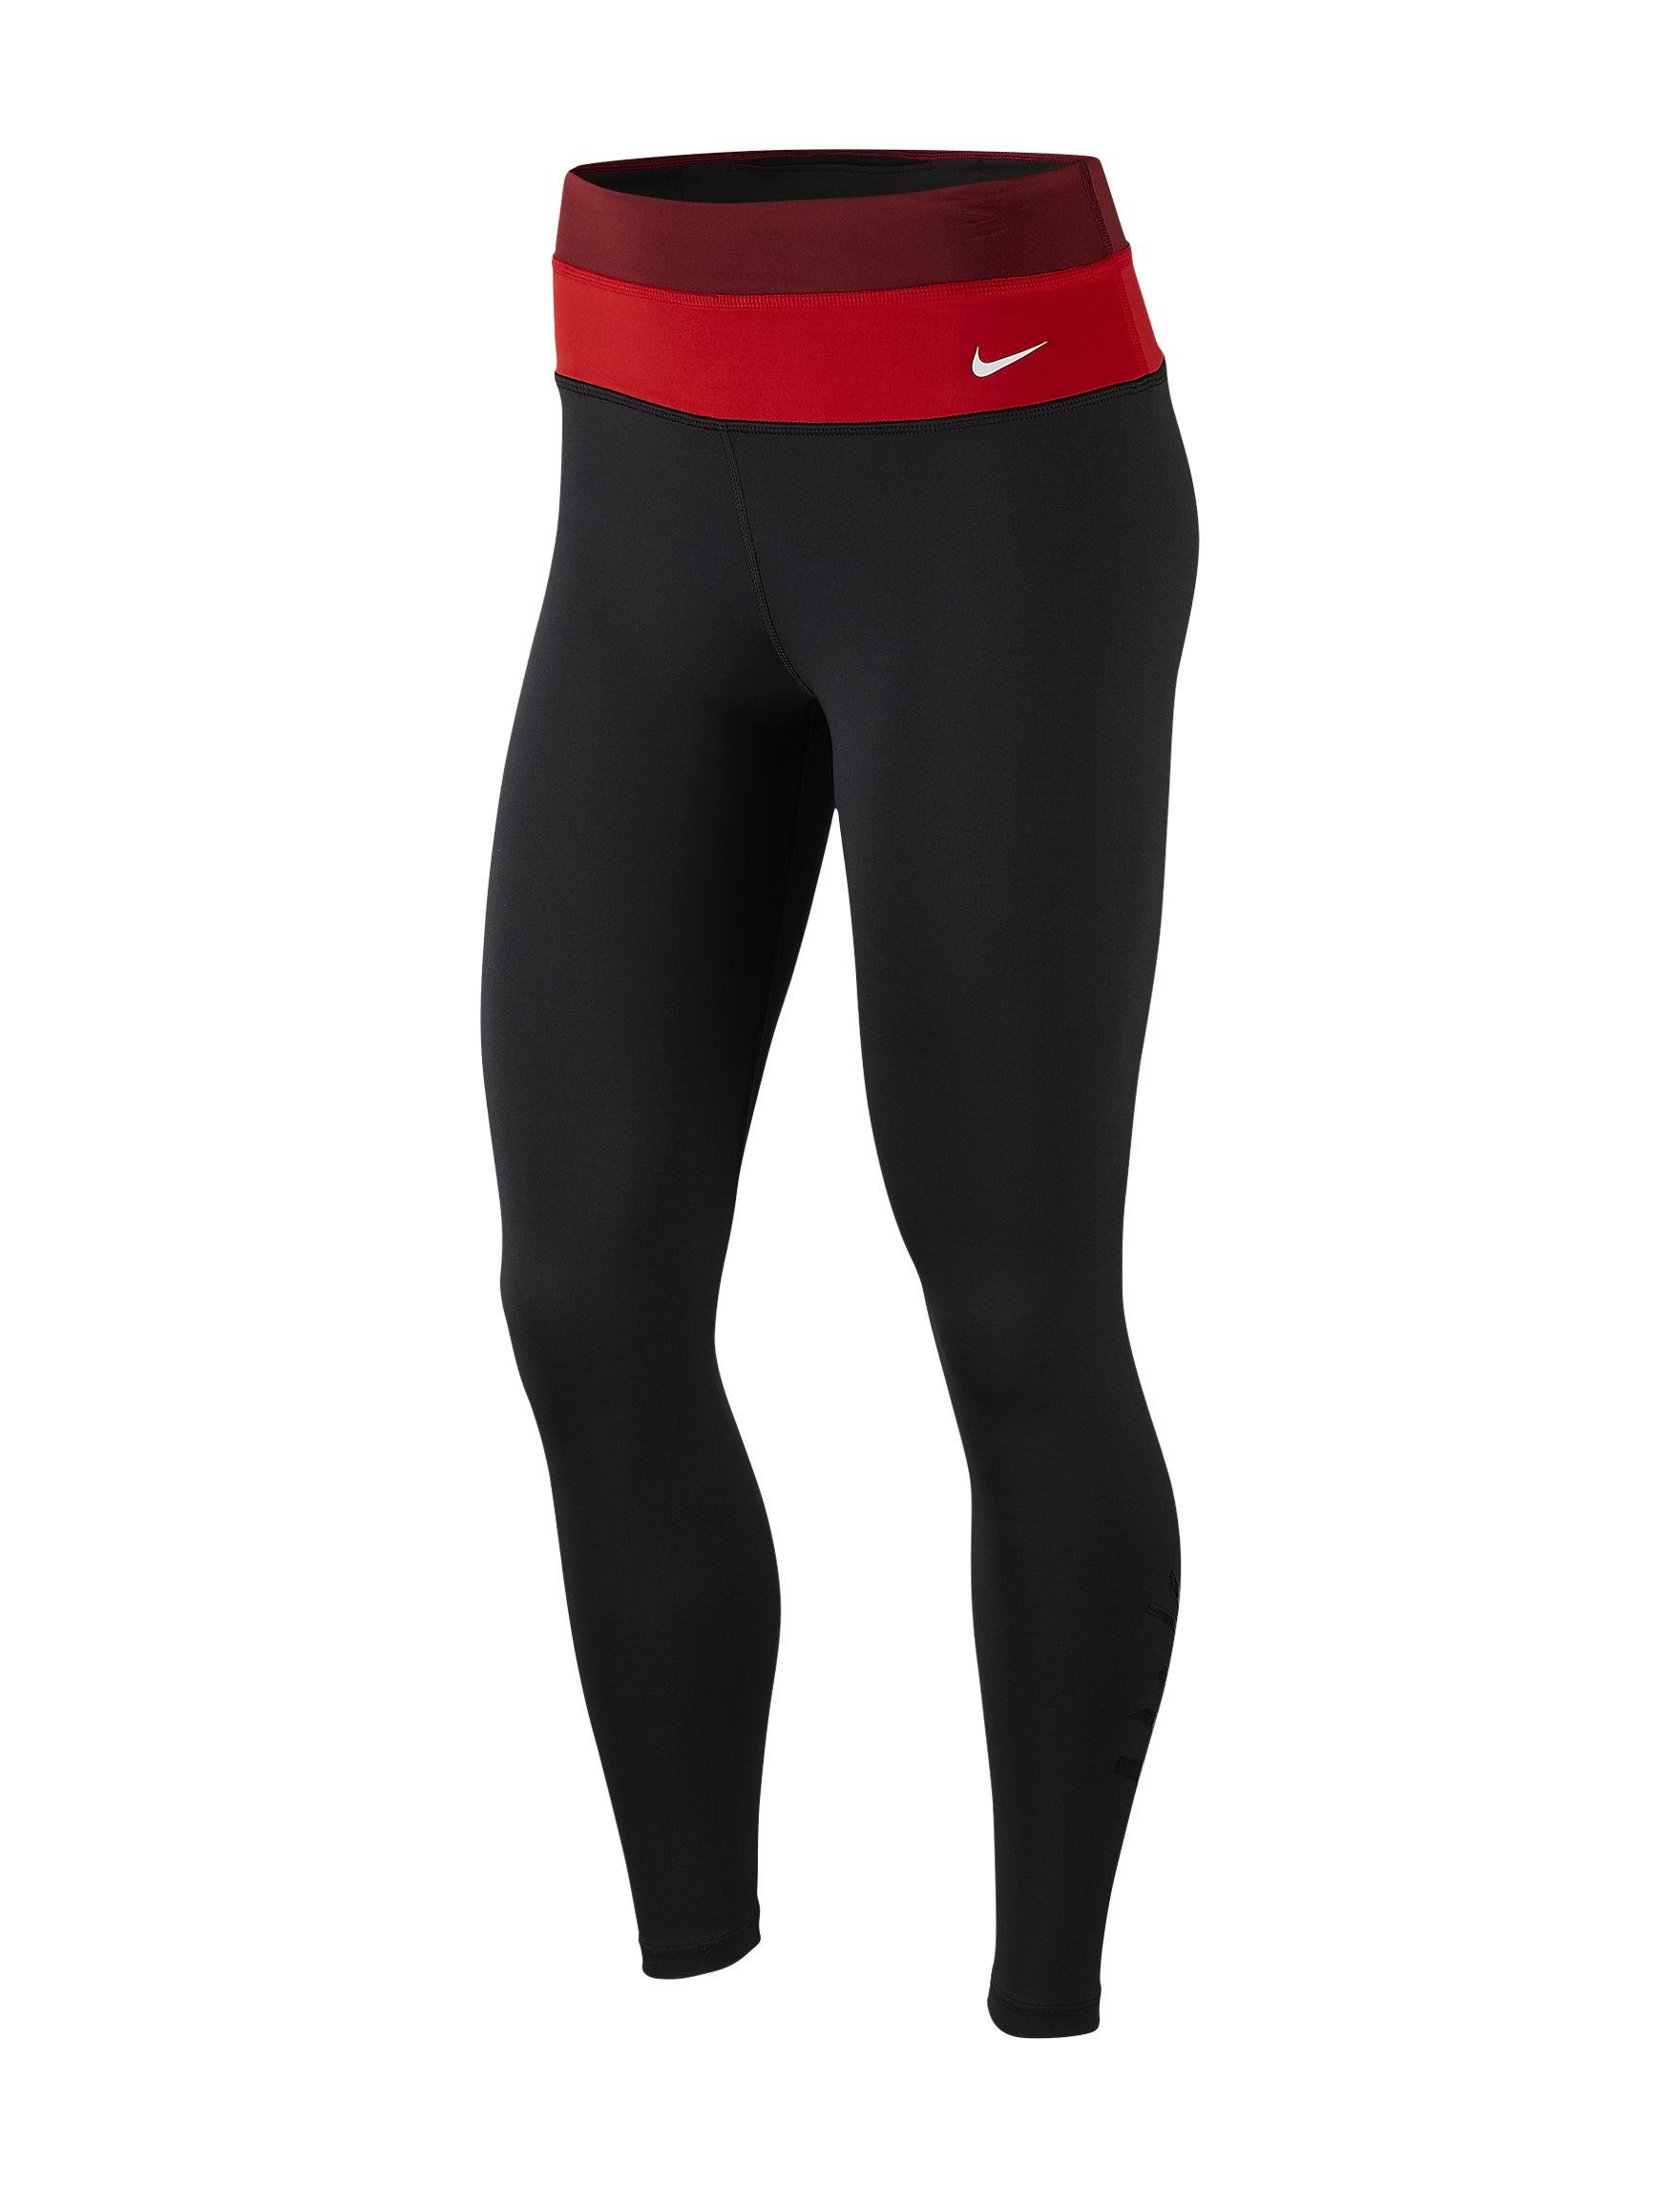 Nike Black / Red Active Leggings